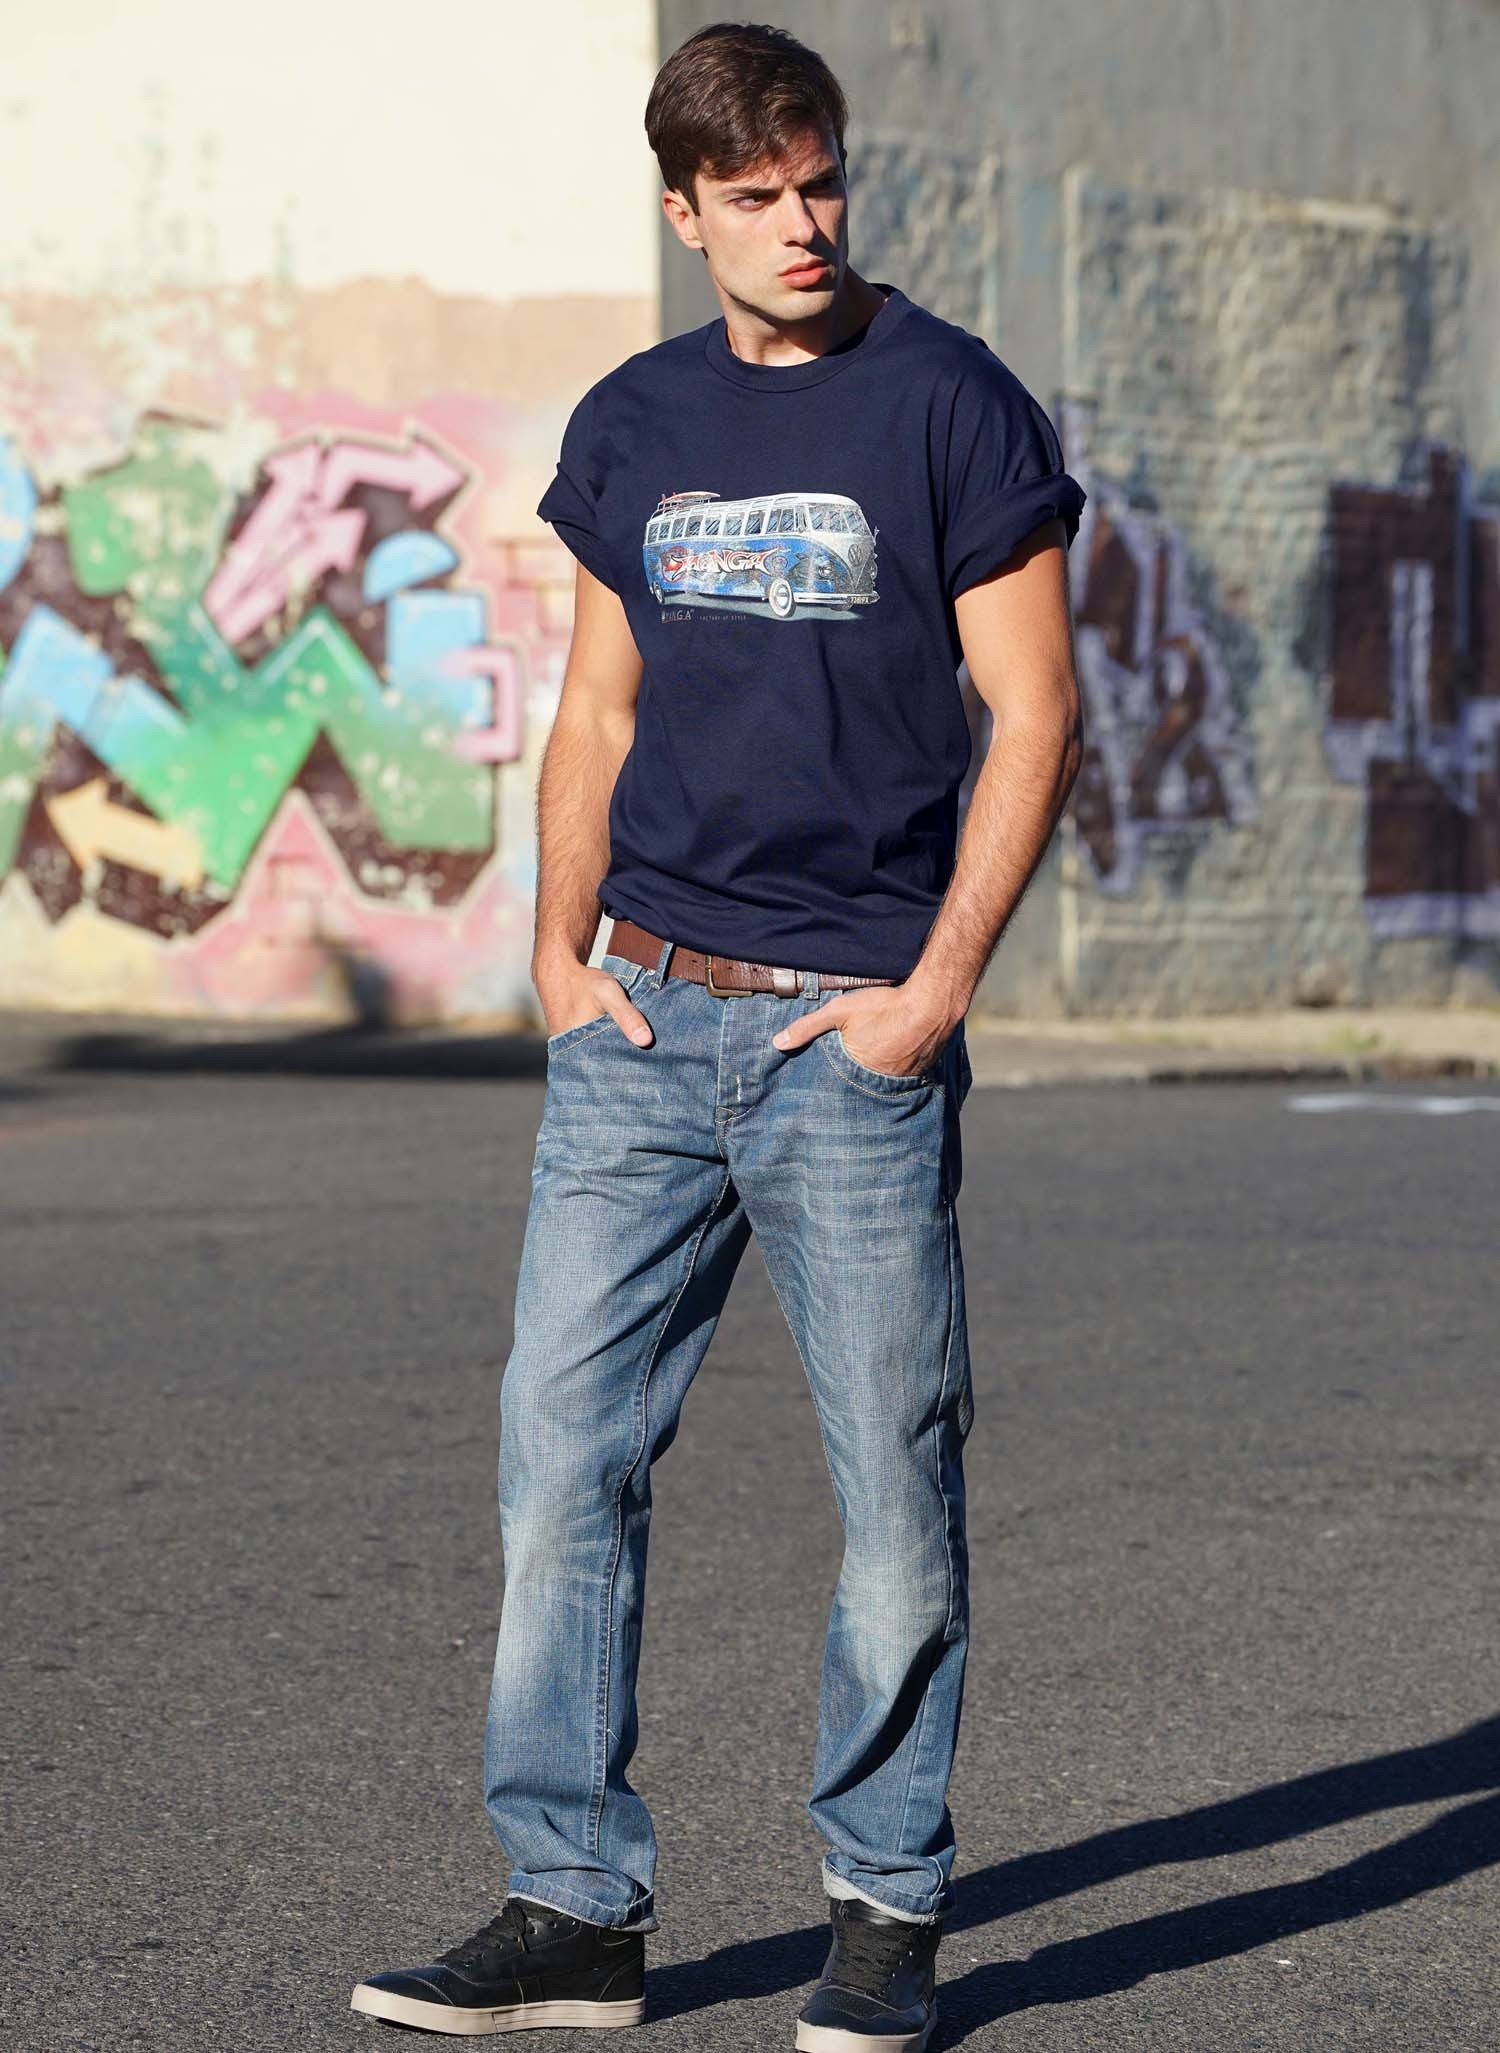 H-5-P-Jeans,Sitzfalten,Blue-D. 38 050 - 1 - Ronja.ch